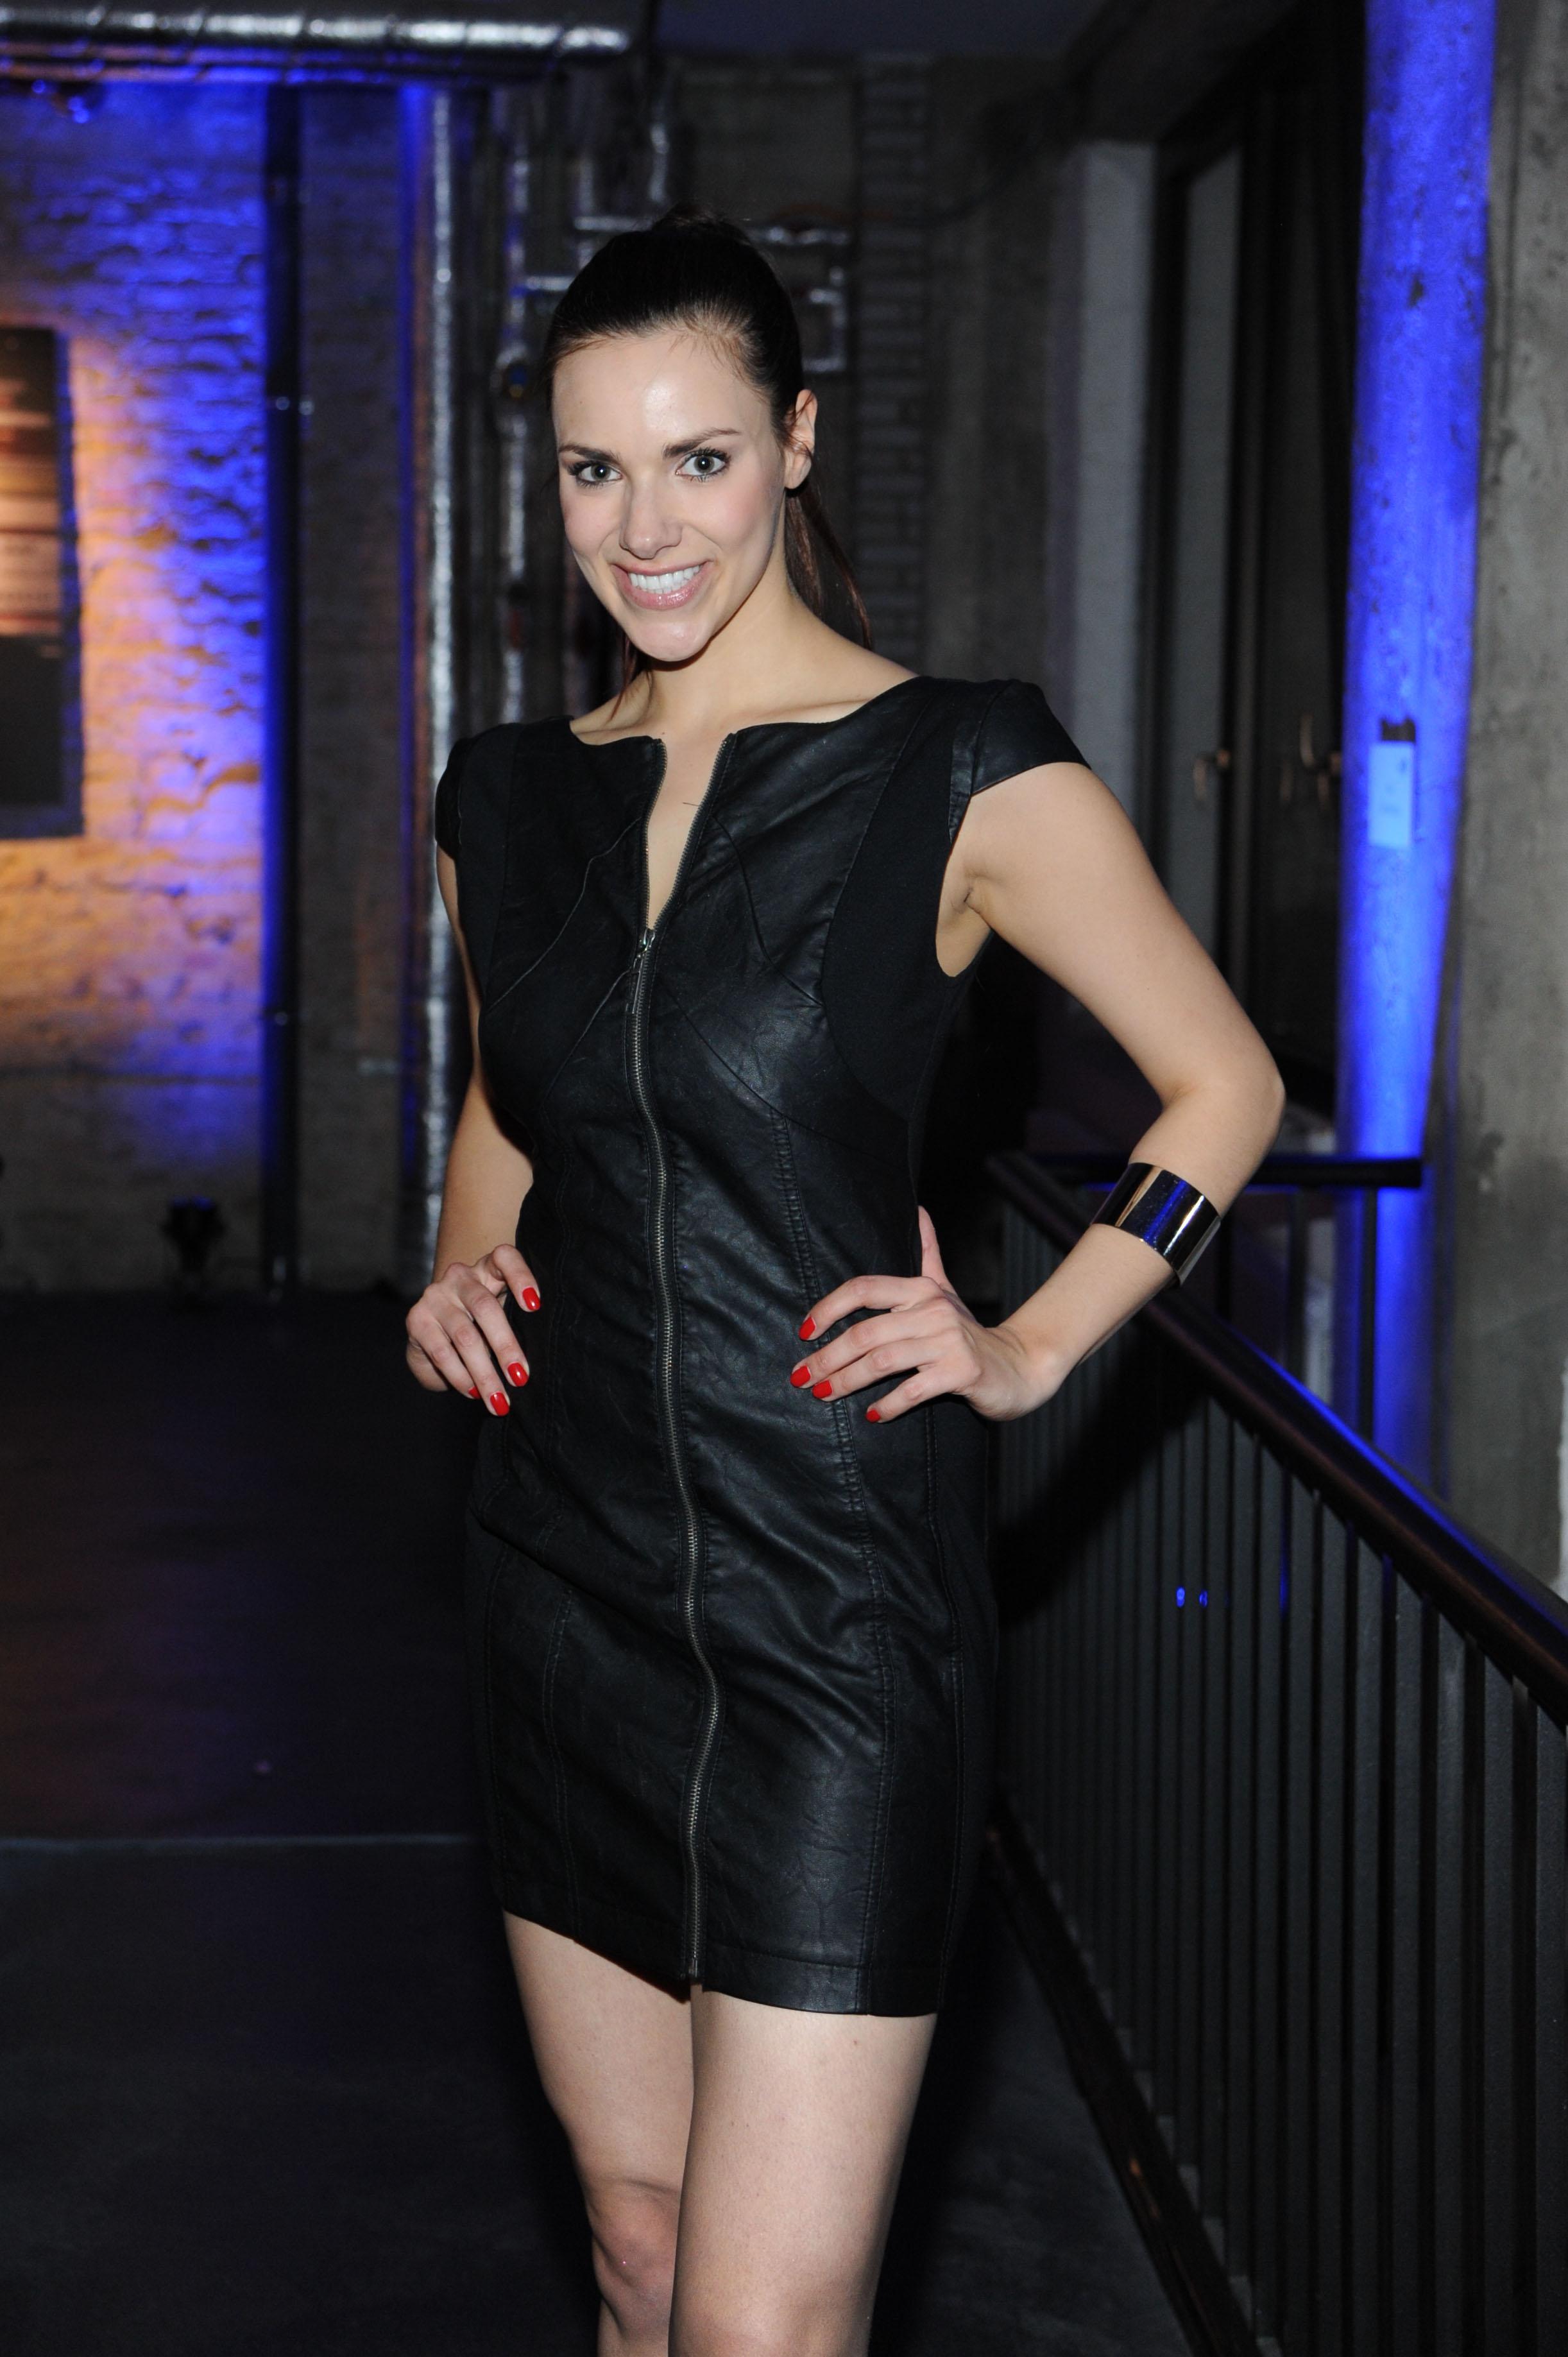 idol celebs com Esther Sedlaczek 110407 11